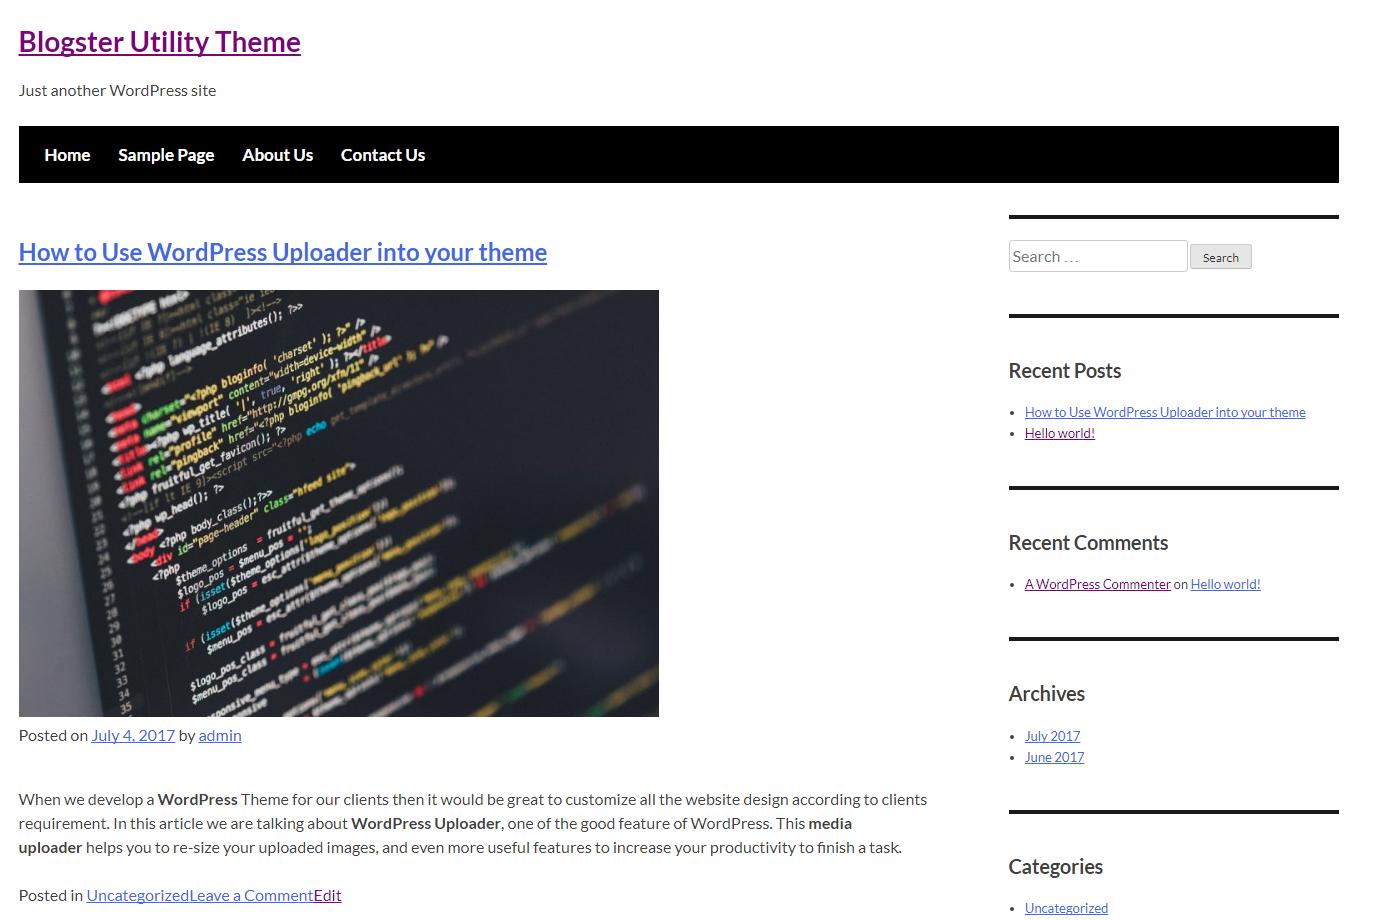 https://themes.svn.wordpress.org/blogster-utility/1.0.1/screenshot.png